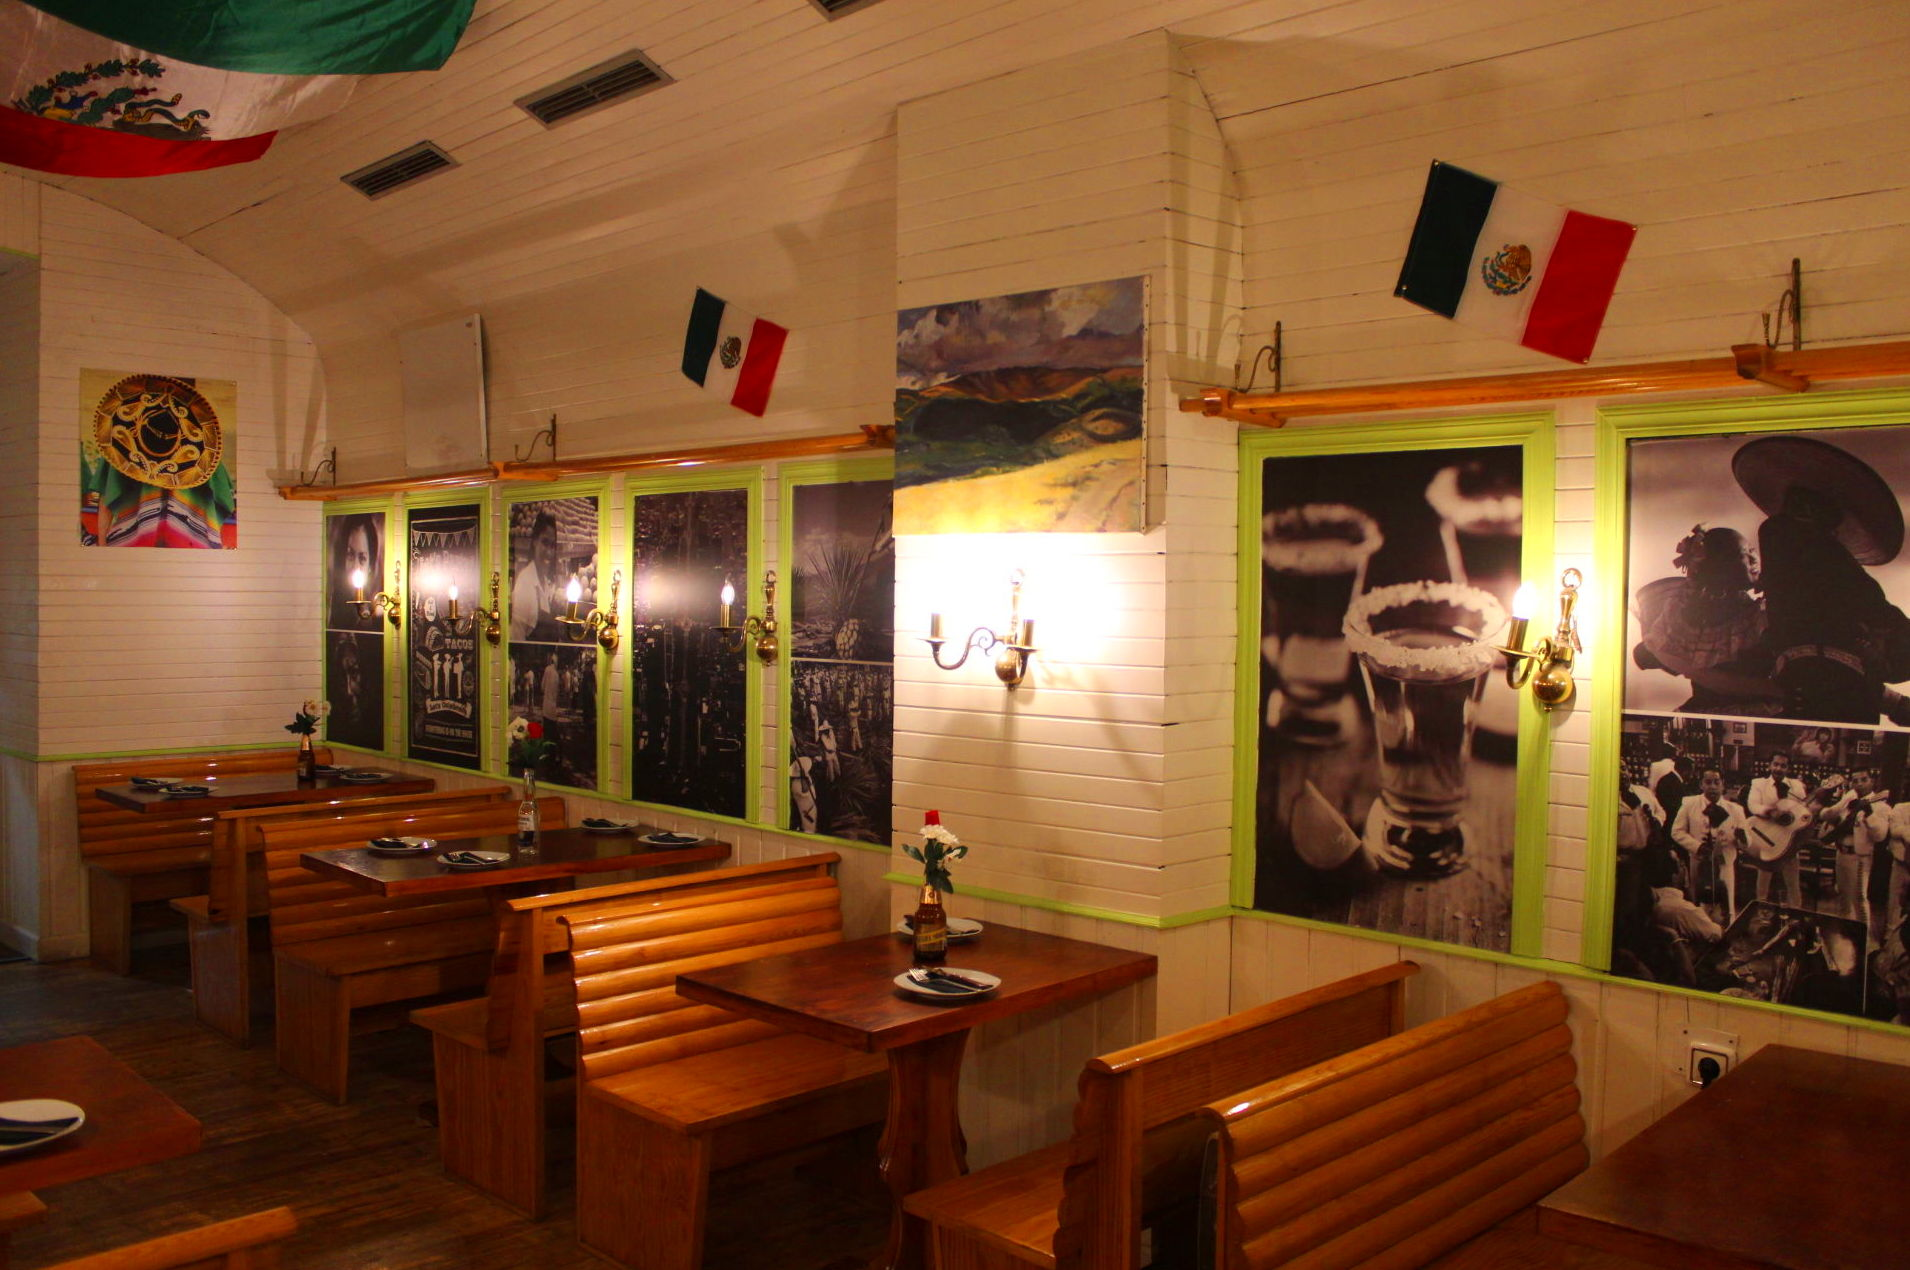 Foto 10 de Cocina mexicana en Madrid | Restaurante Mezcal